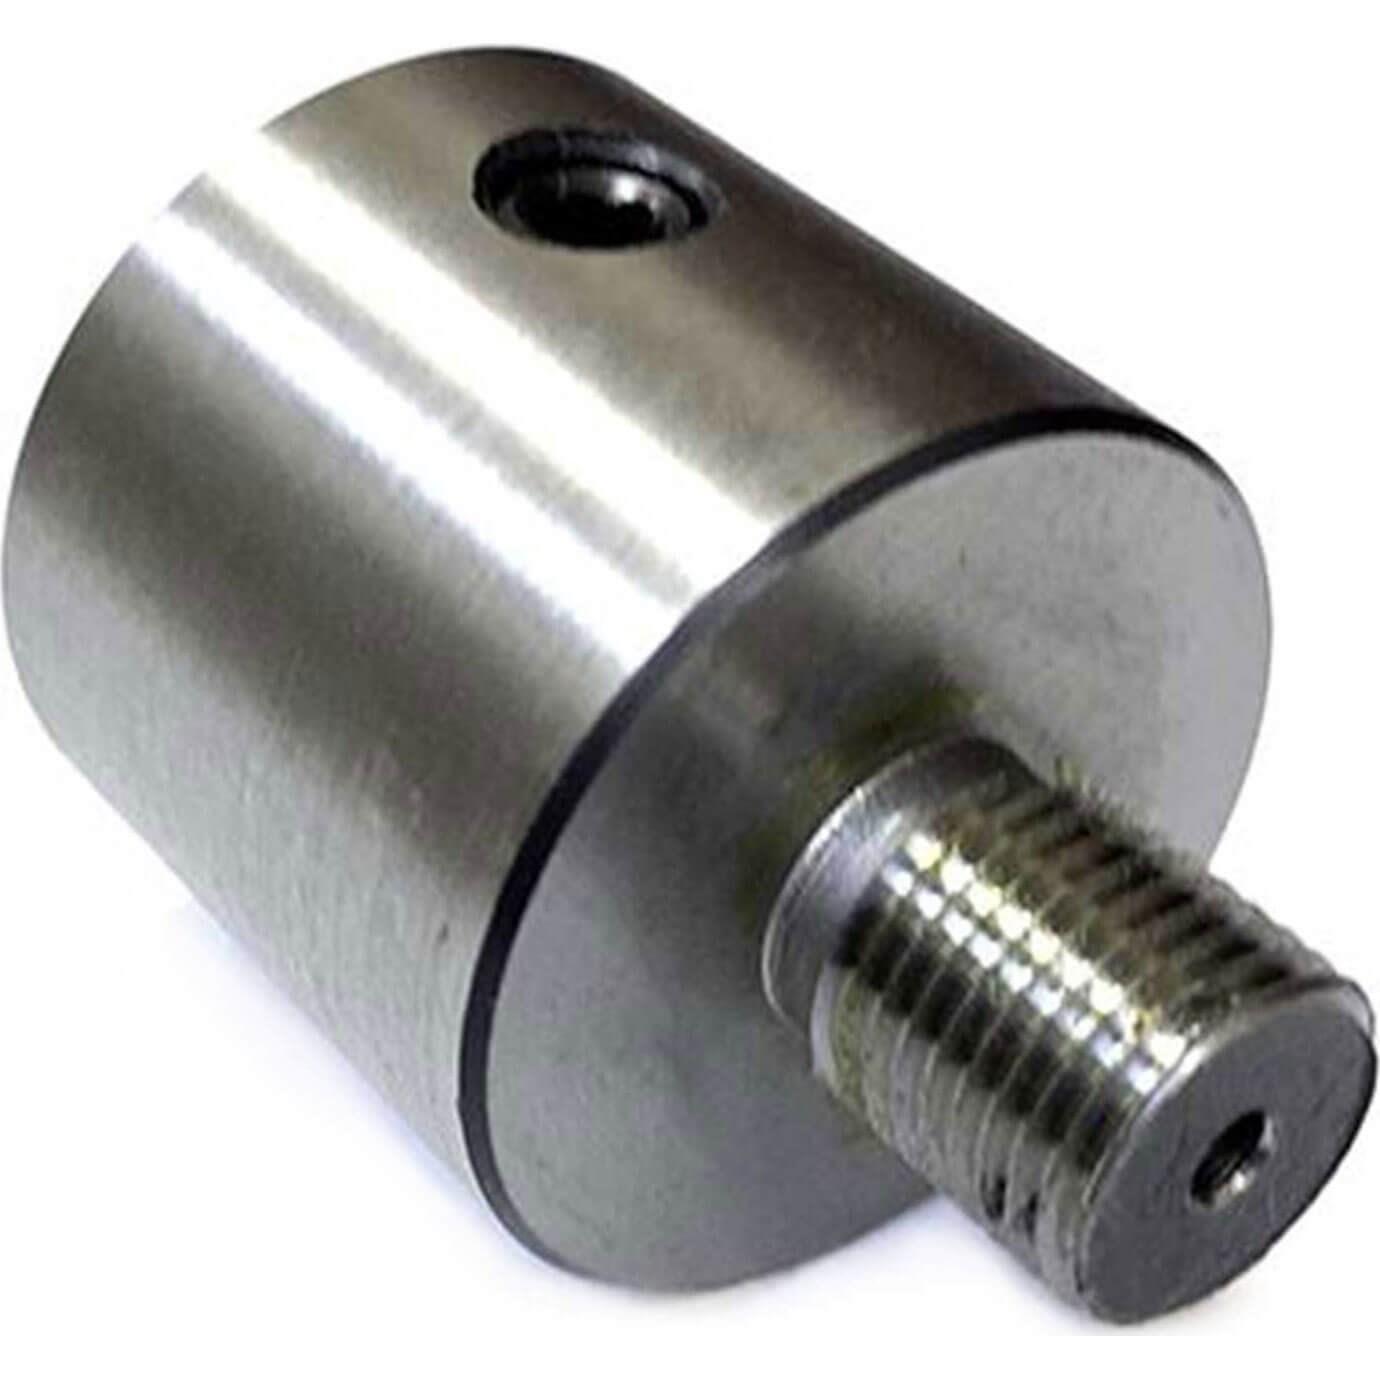 Rotabroach Magnetic Swarf Stick